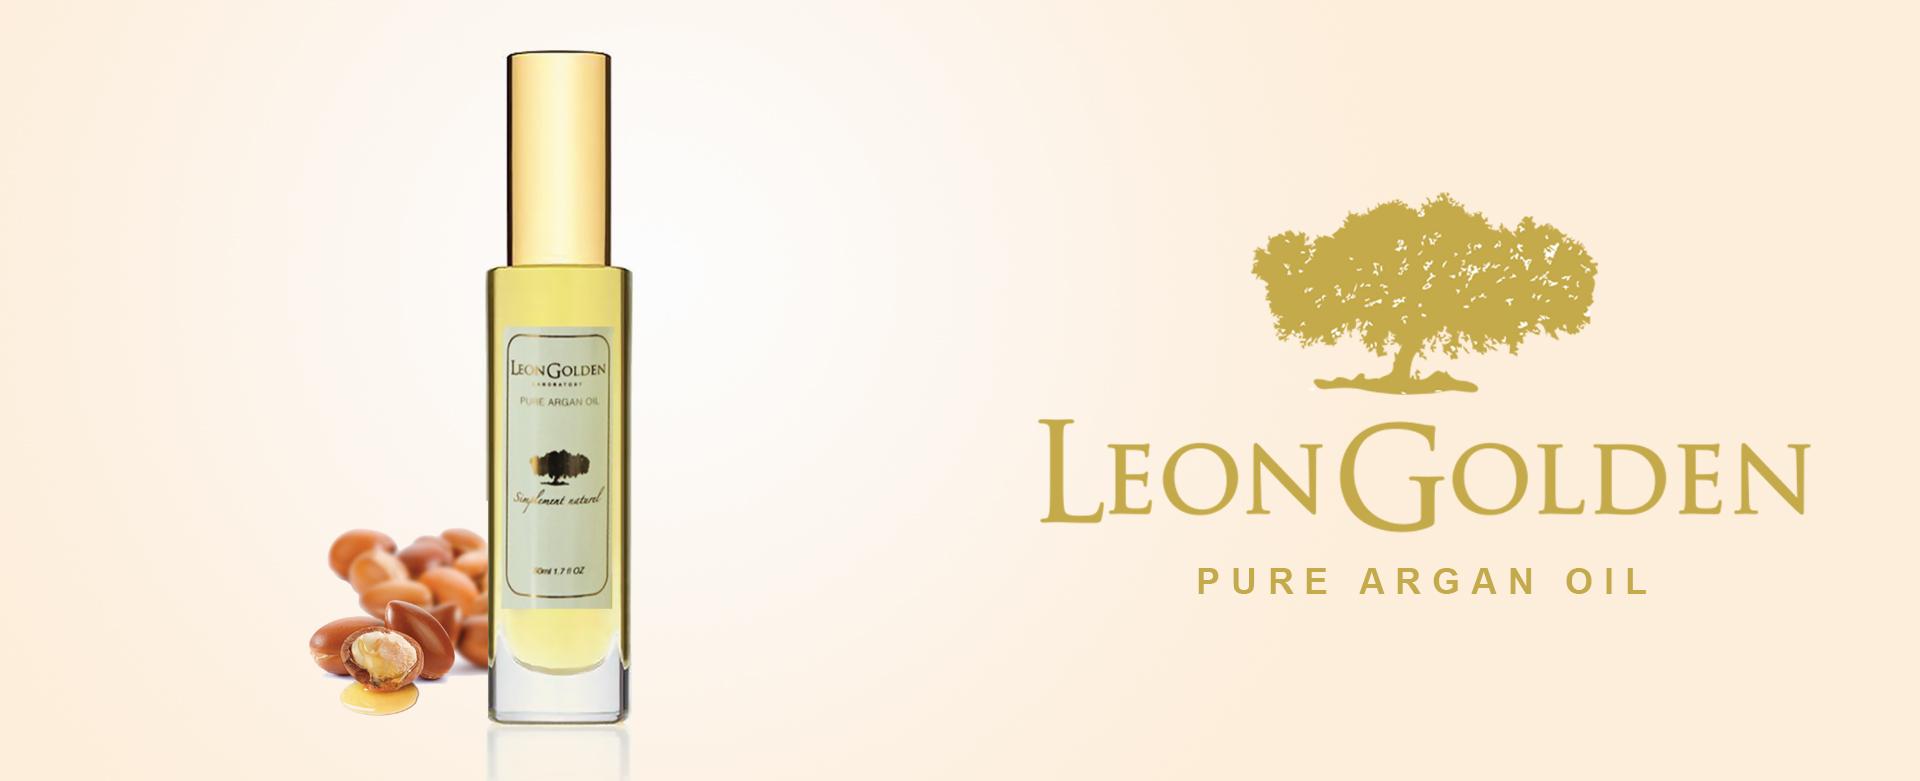 Leon Golden Pure Argan Oil